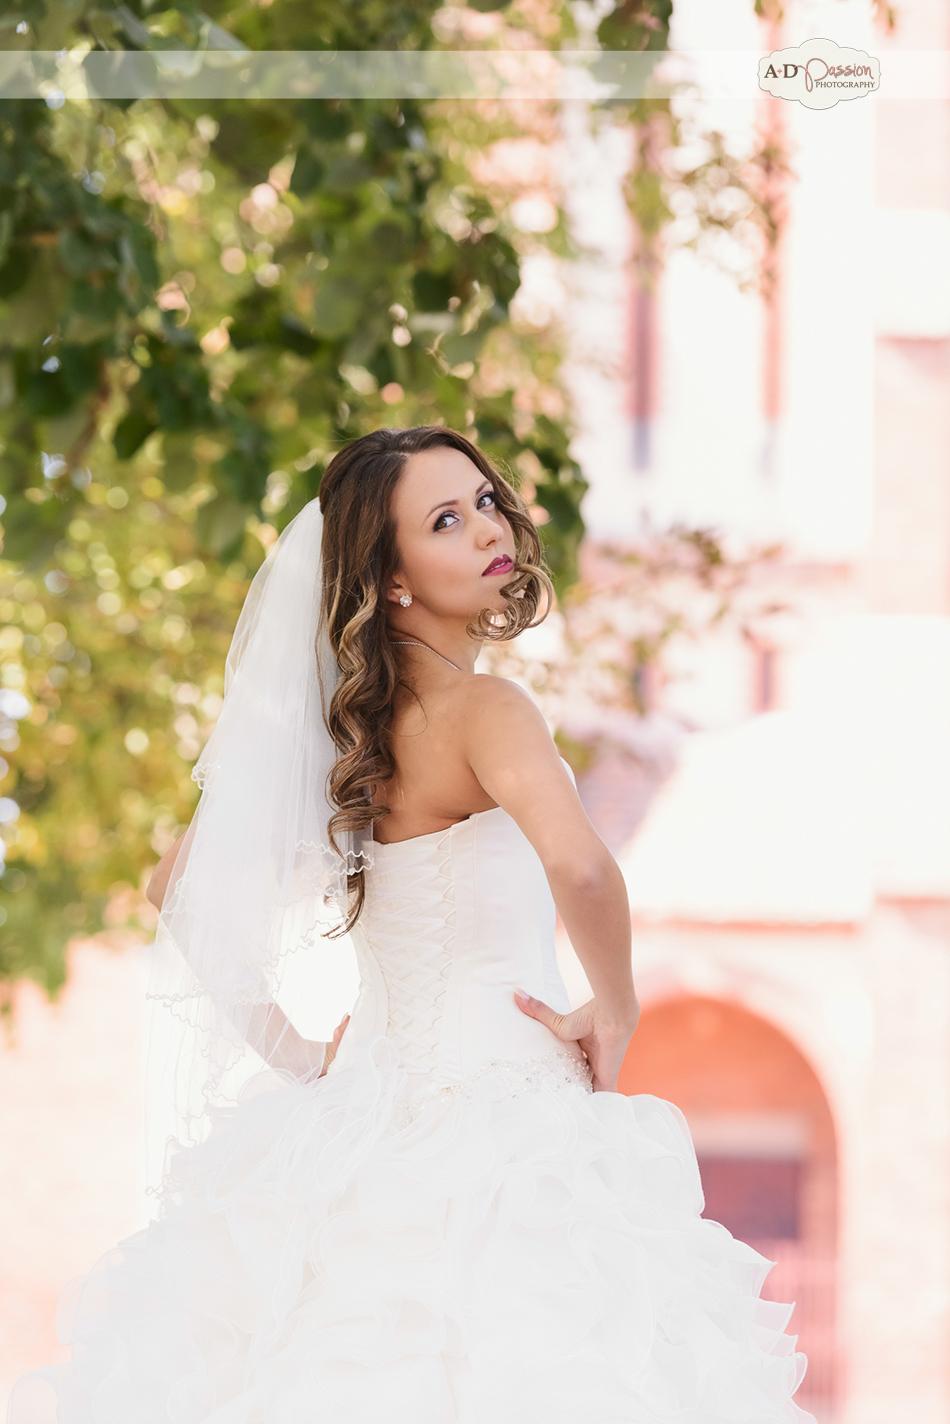 AD Passion Photography | sami+eli_fotograf-de-nunta-timisoara_fotografie-vintage_fotograf-profesionist_0030 | Adelin, Dida, fotograf profesionist, fotograf de nunta, fotografie de nunta, fotograf Timisoara, fotograf Craiova, fotograf Bucuresti, fotograf Arad, nunta Timisoara, nunta Arad, nunta Bucuresti, nunta Craiova